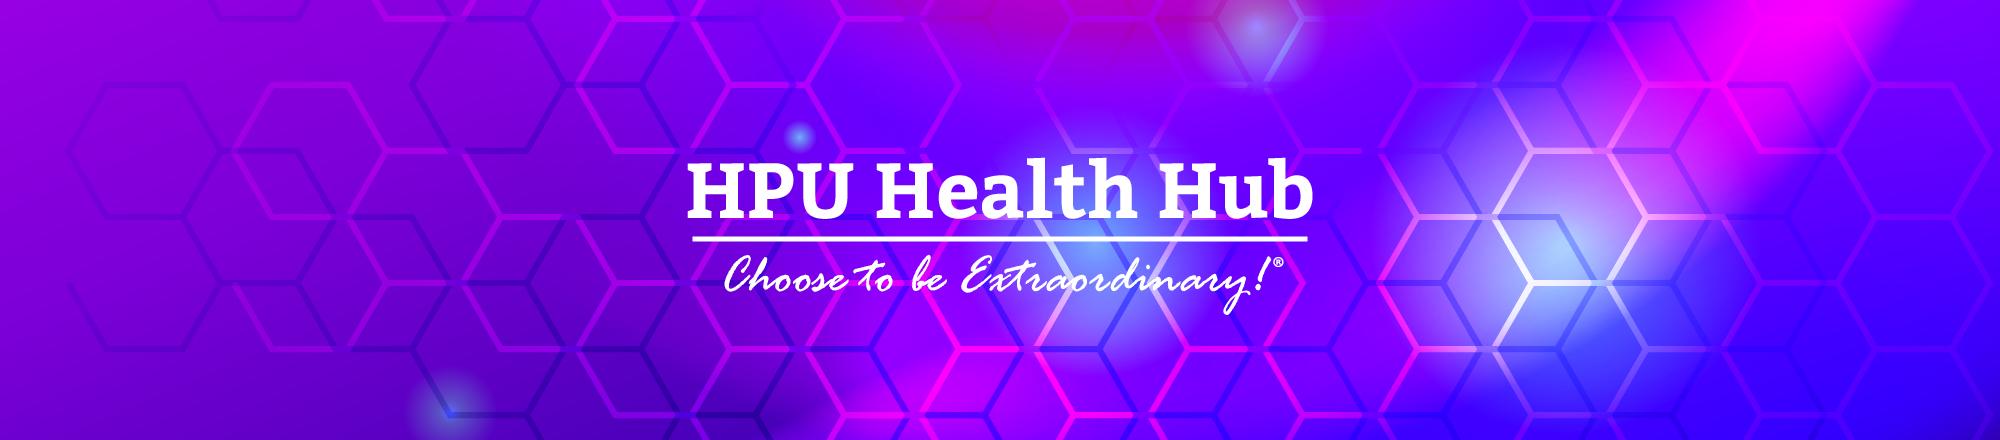 HPU's Health Hub